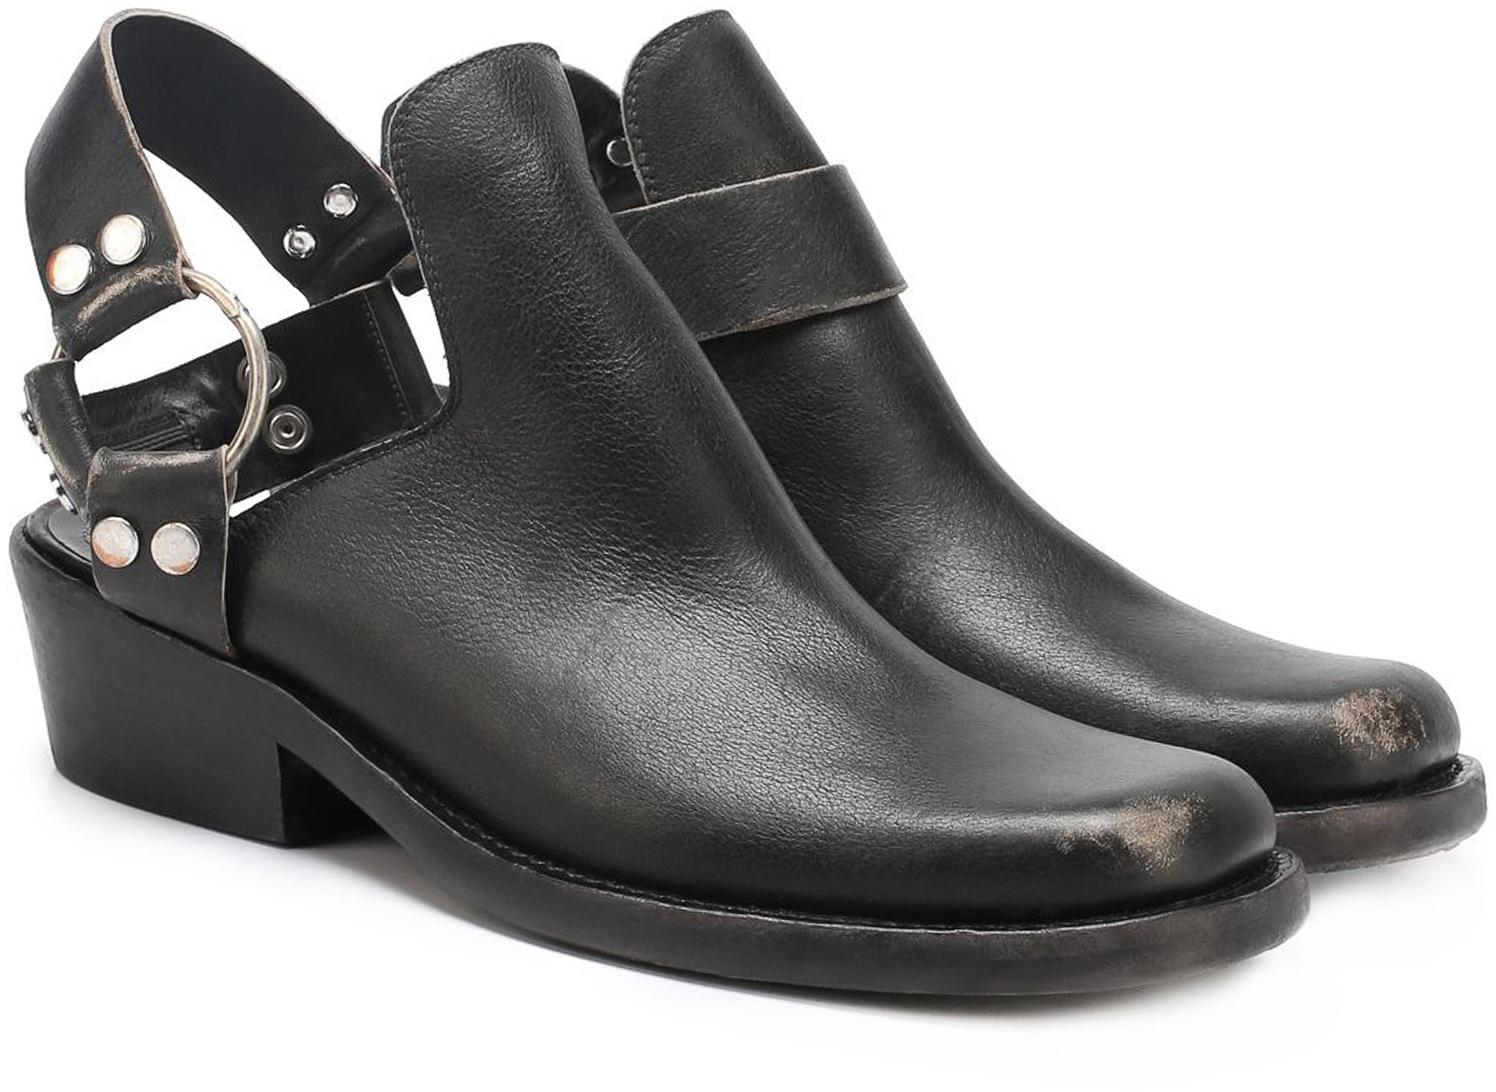 Outlet scarpe donna Balenciaga originali - Italian Boutique a8f9a35bc4af